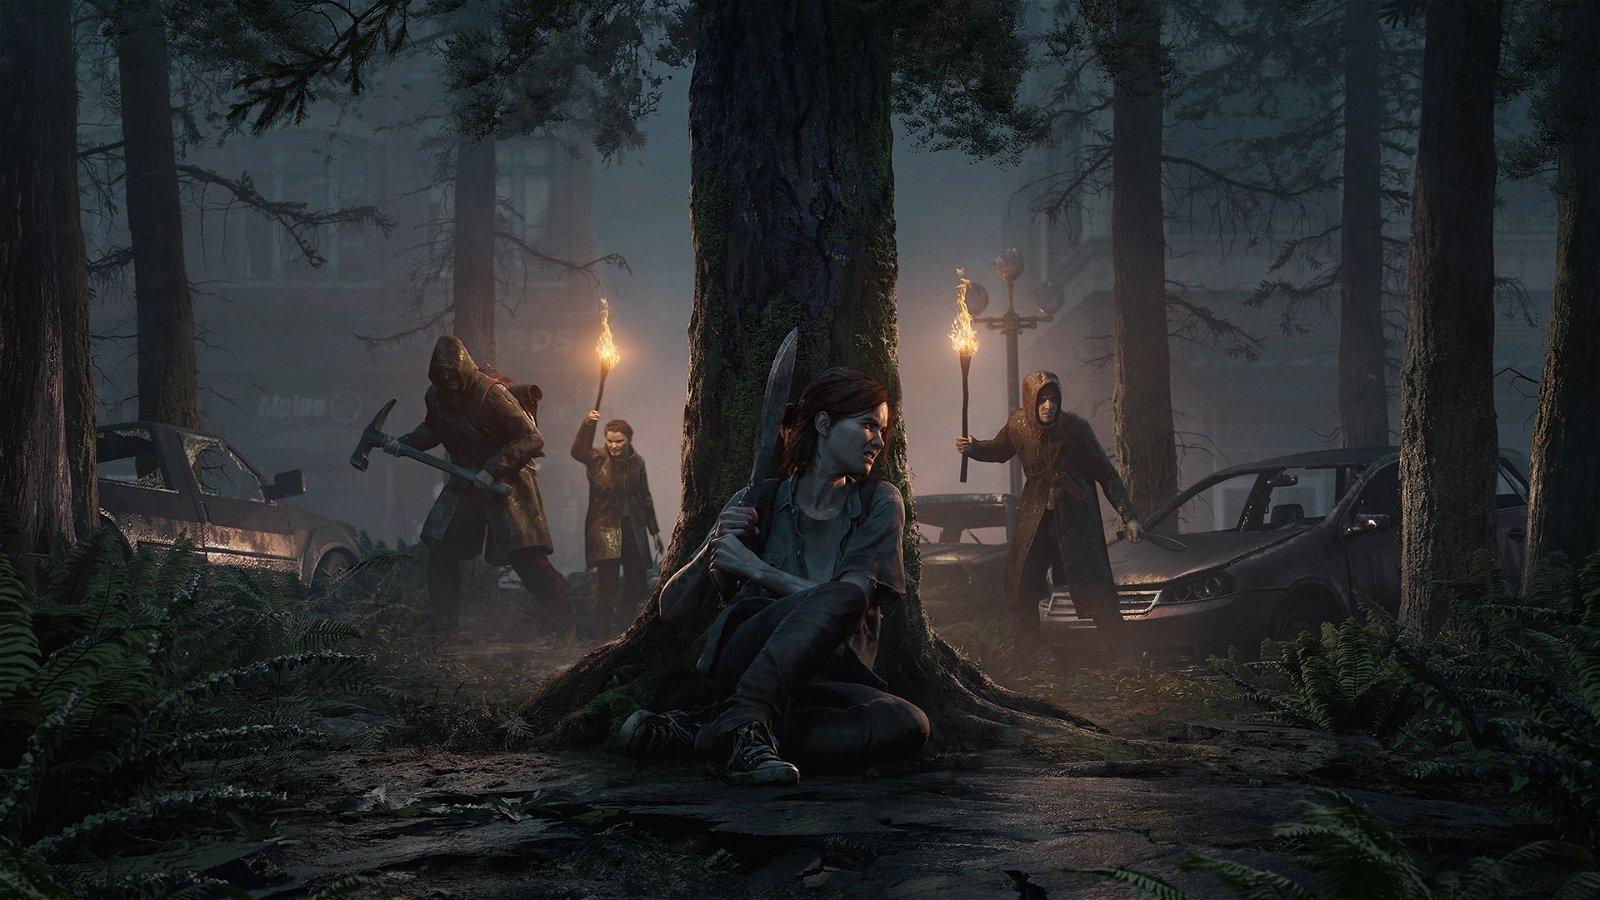 The Last of Us 2 Delayed Indefinitely